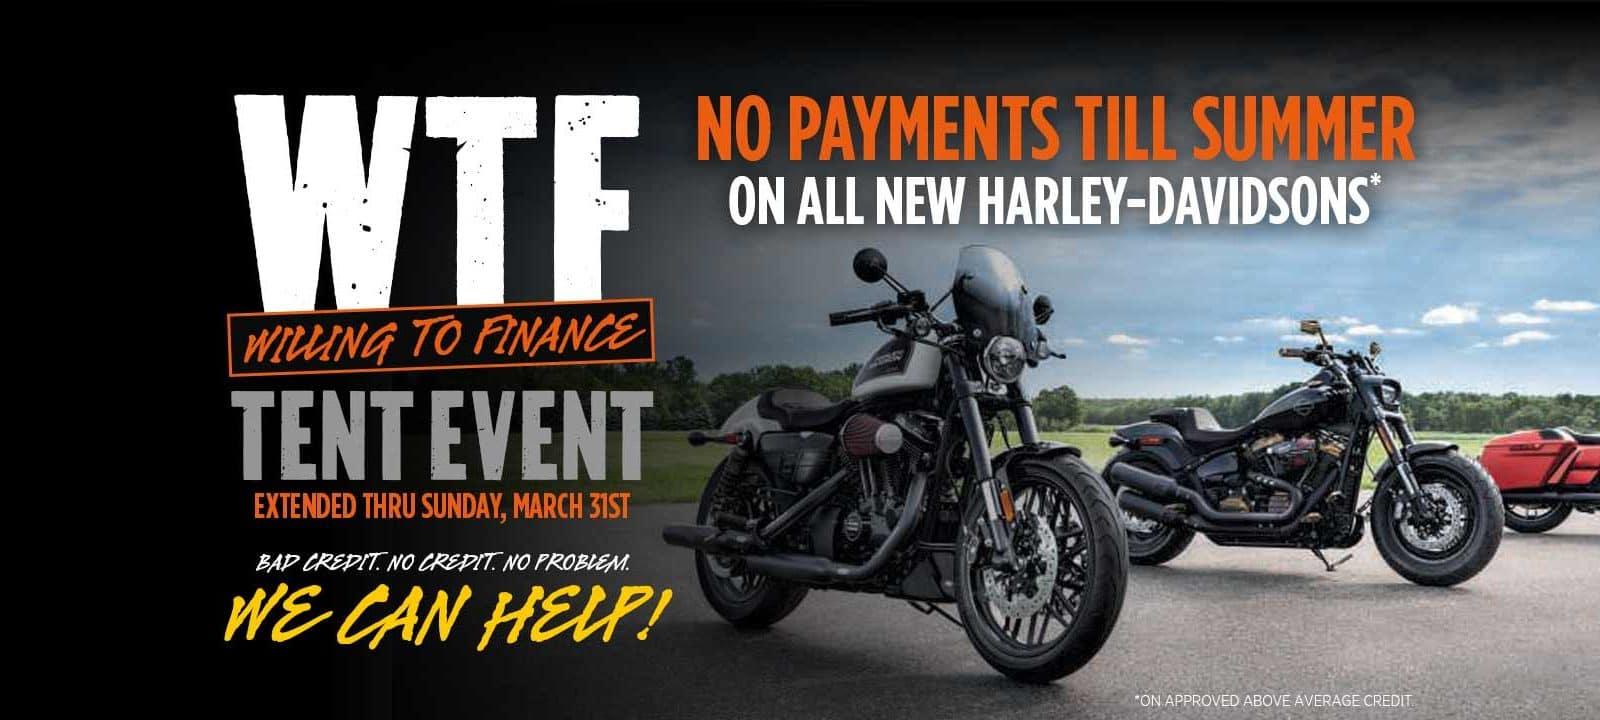 20190325-RSHD-1800x720-WTF-Tent-Event-No-Payments